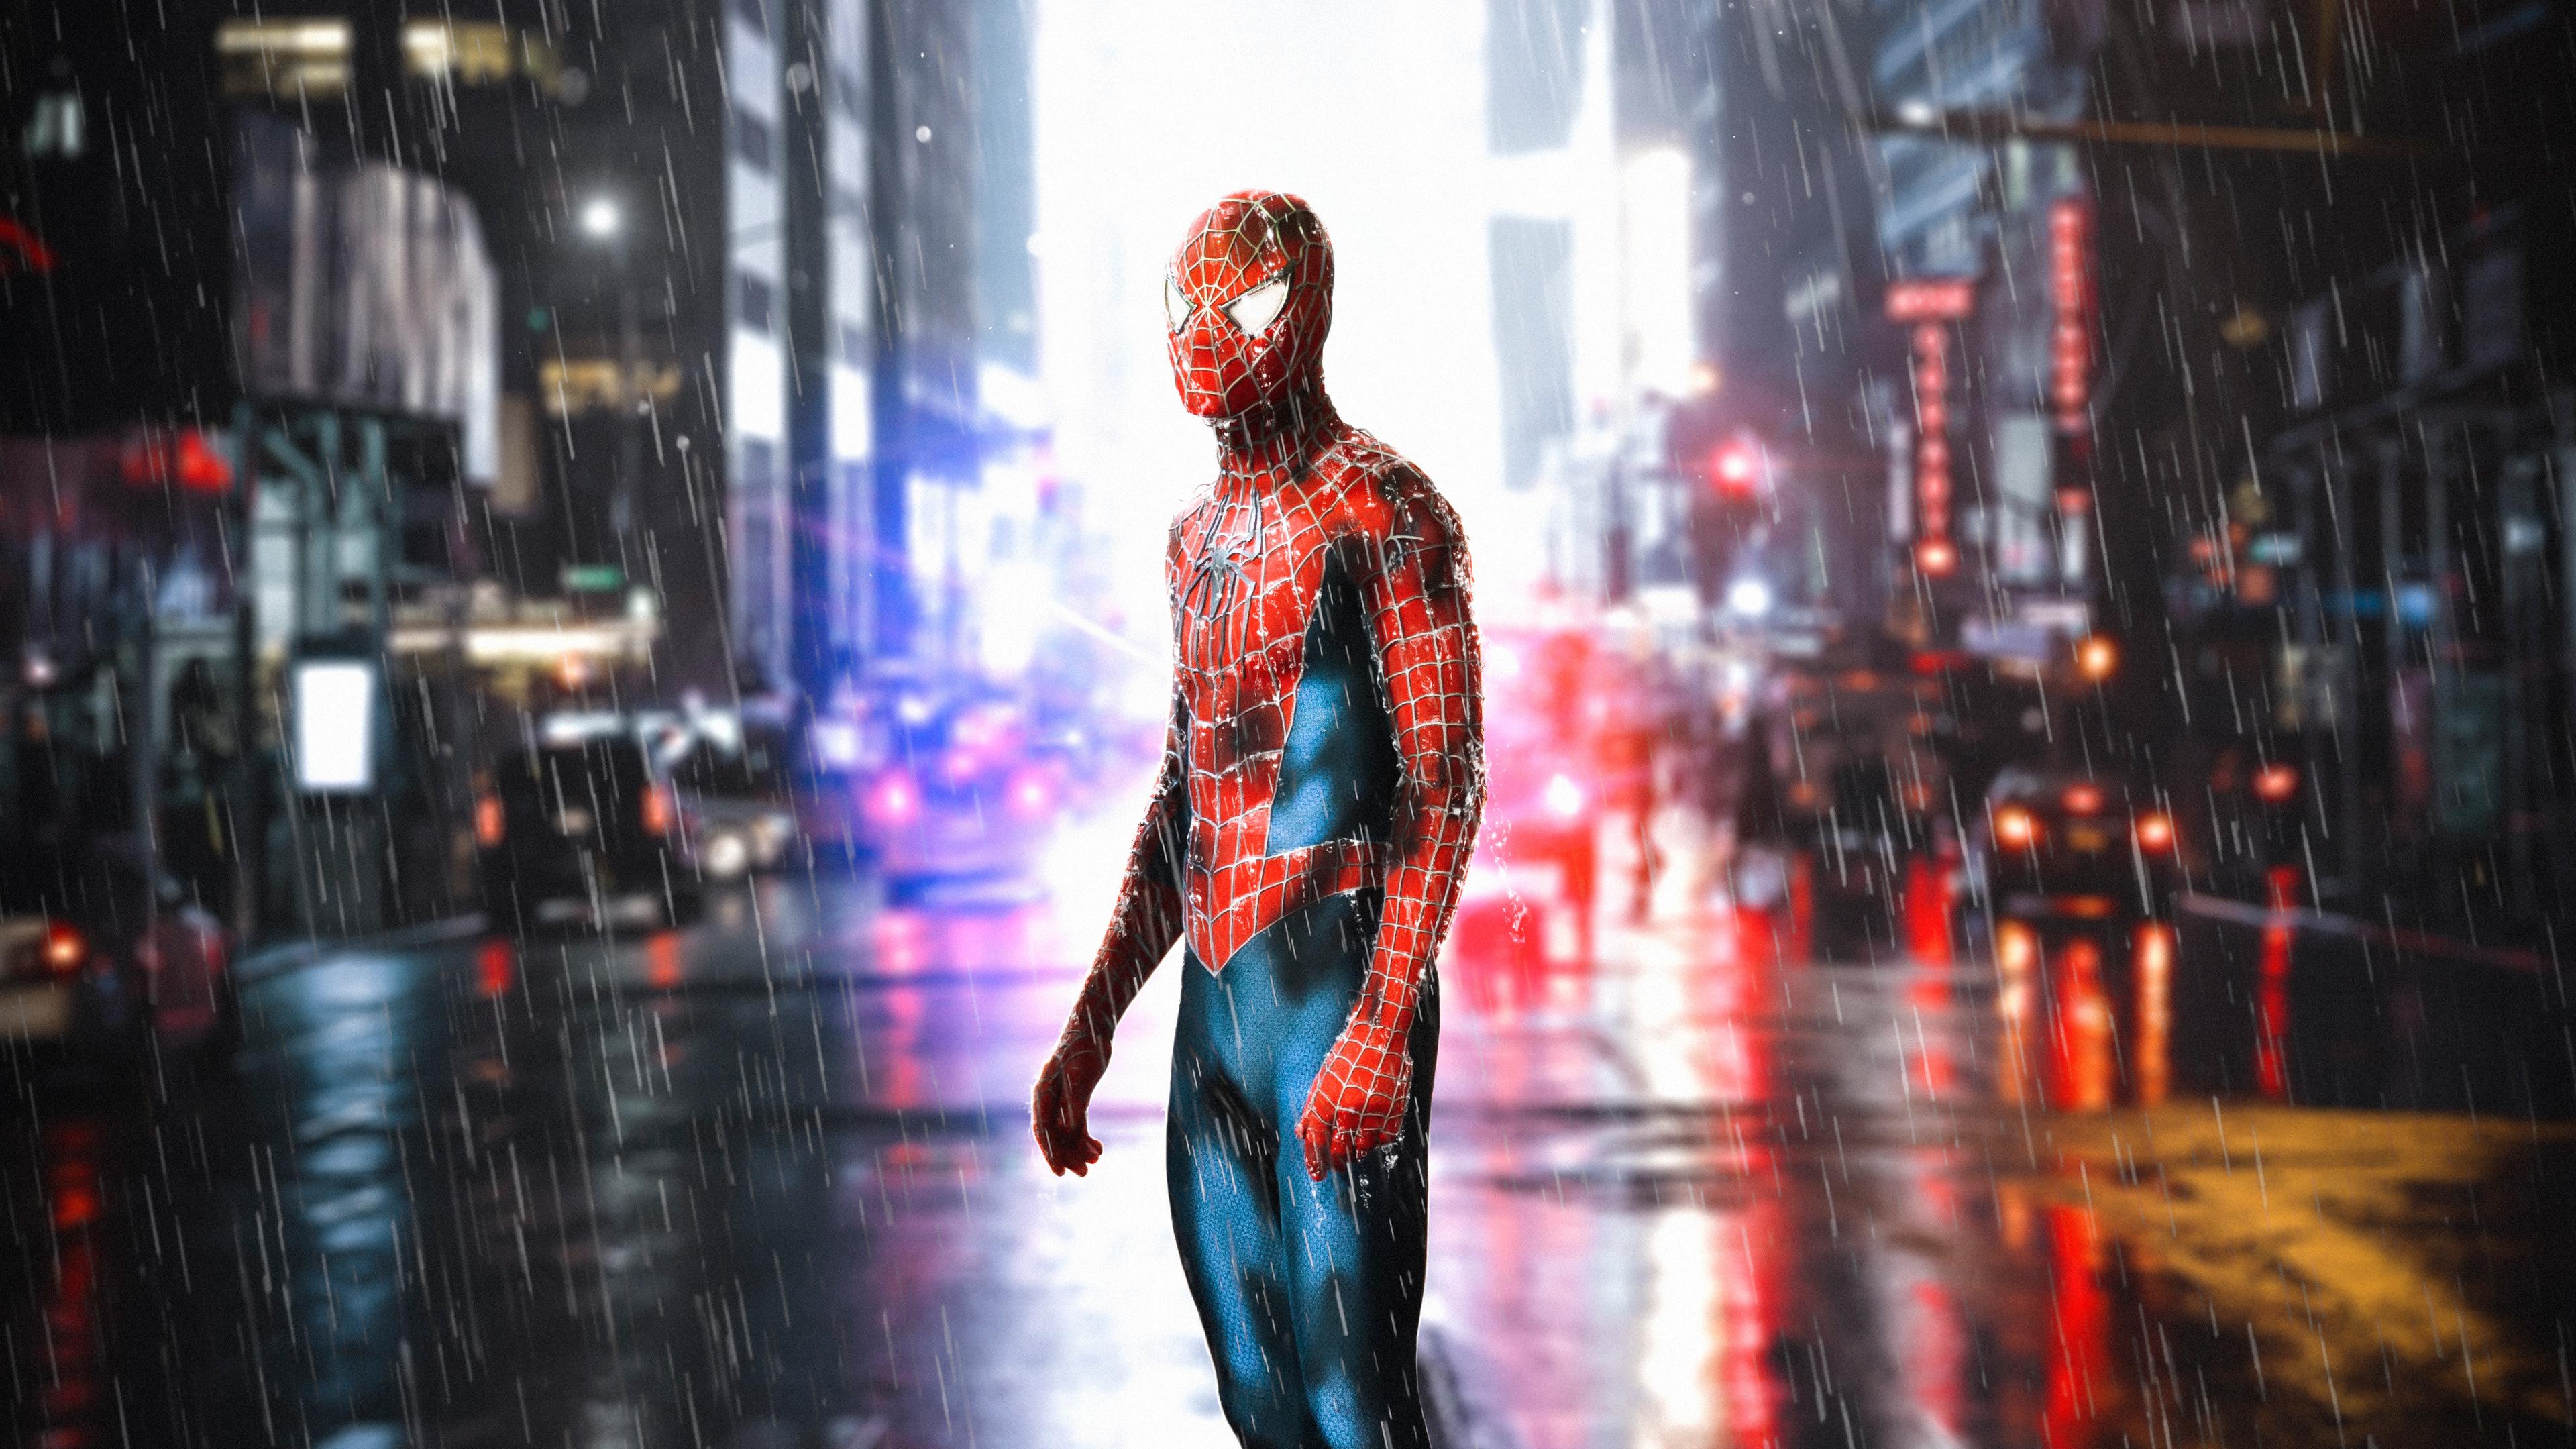 spiderman standing in rain 4k 1555206608 - Spiderman Standing In Rain 4k - superheroes wallpapers, spiderman wallpapers, hd-wallpapers, digital art wallpapers, deviantart wallpapers, 4k-wallpapers